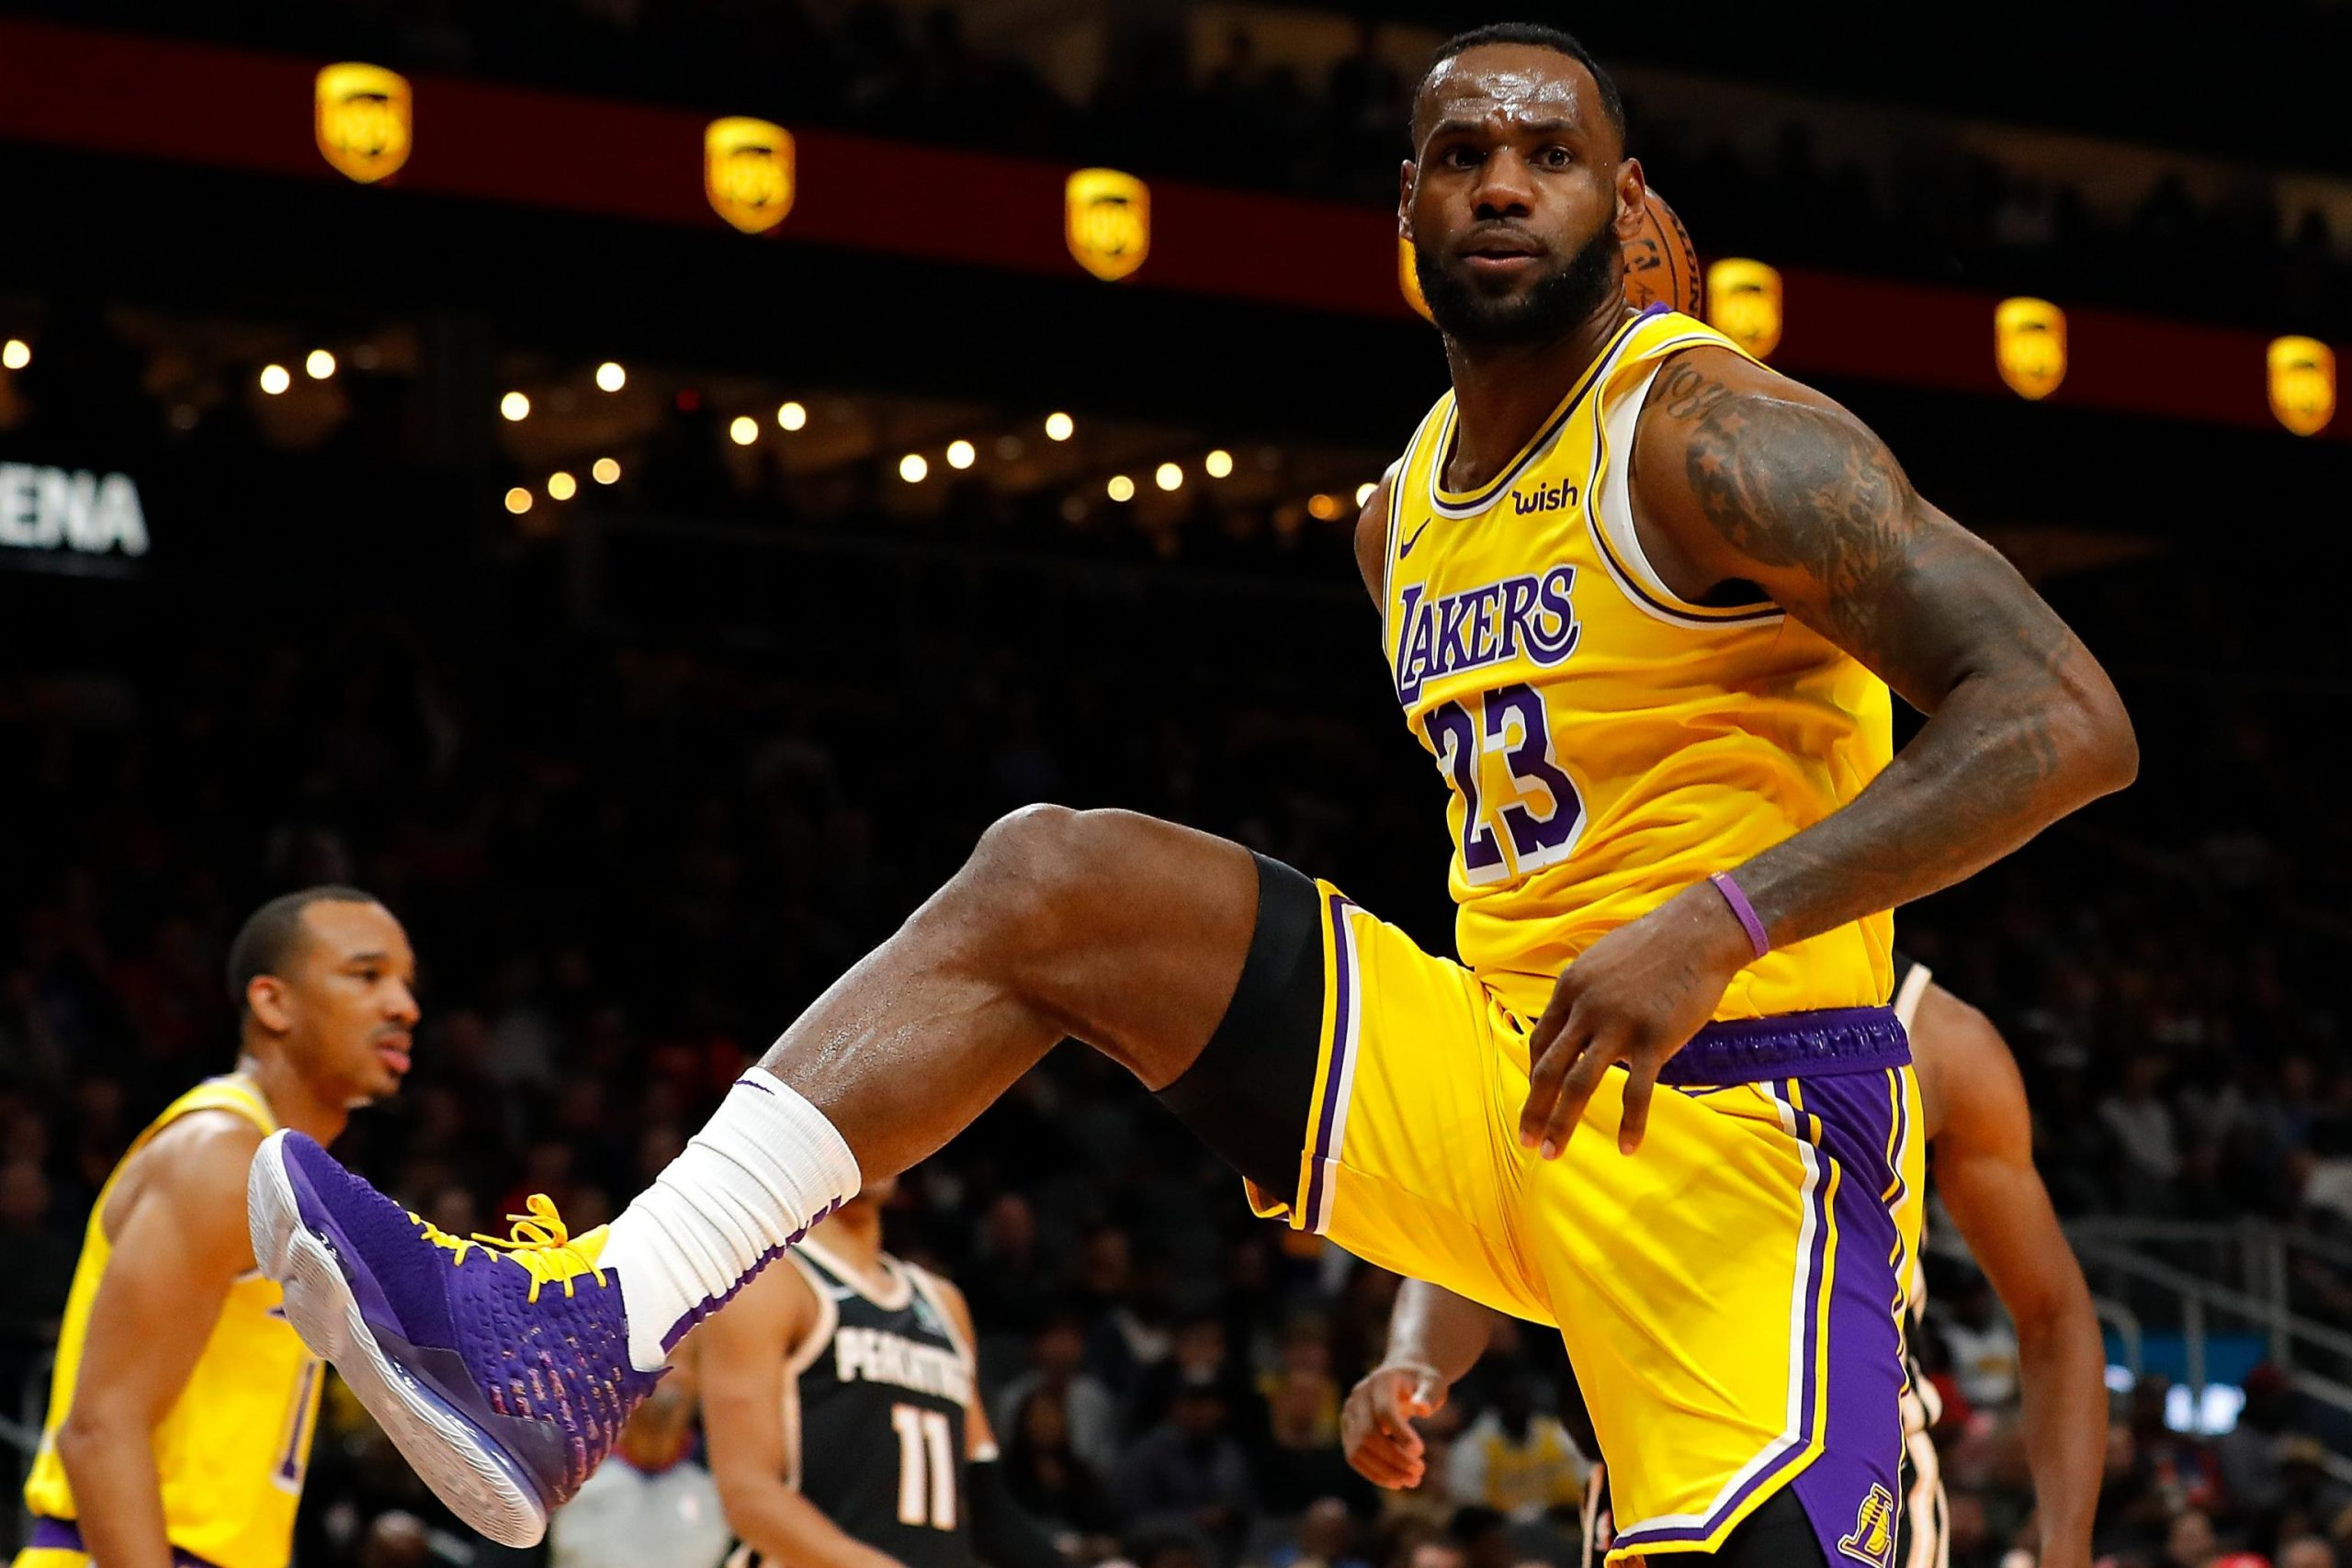 Лос-Анджелес Лейкерс - Торонто Рэпторс. Прогноз и ставки на баскетбол. 3 мая 2021 года